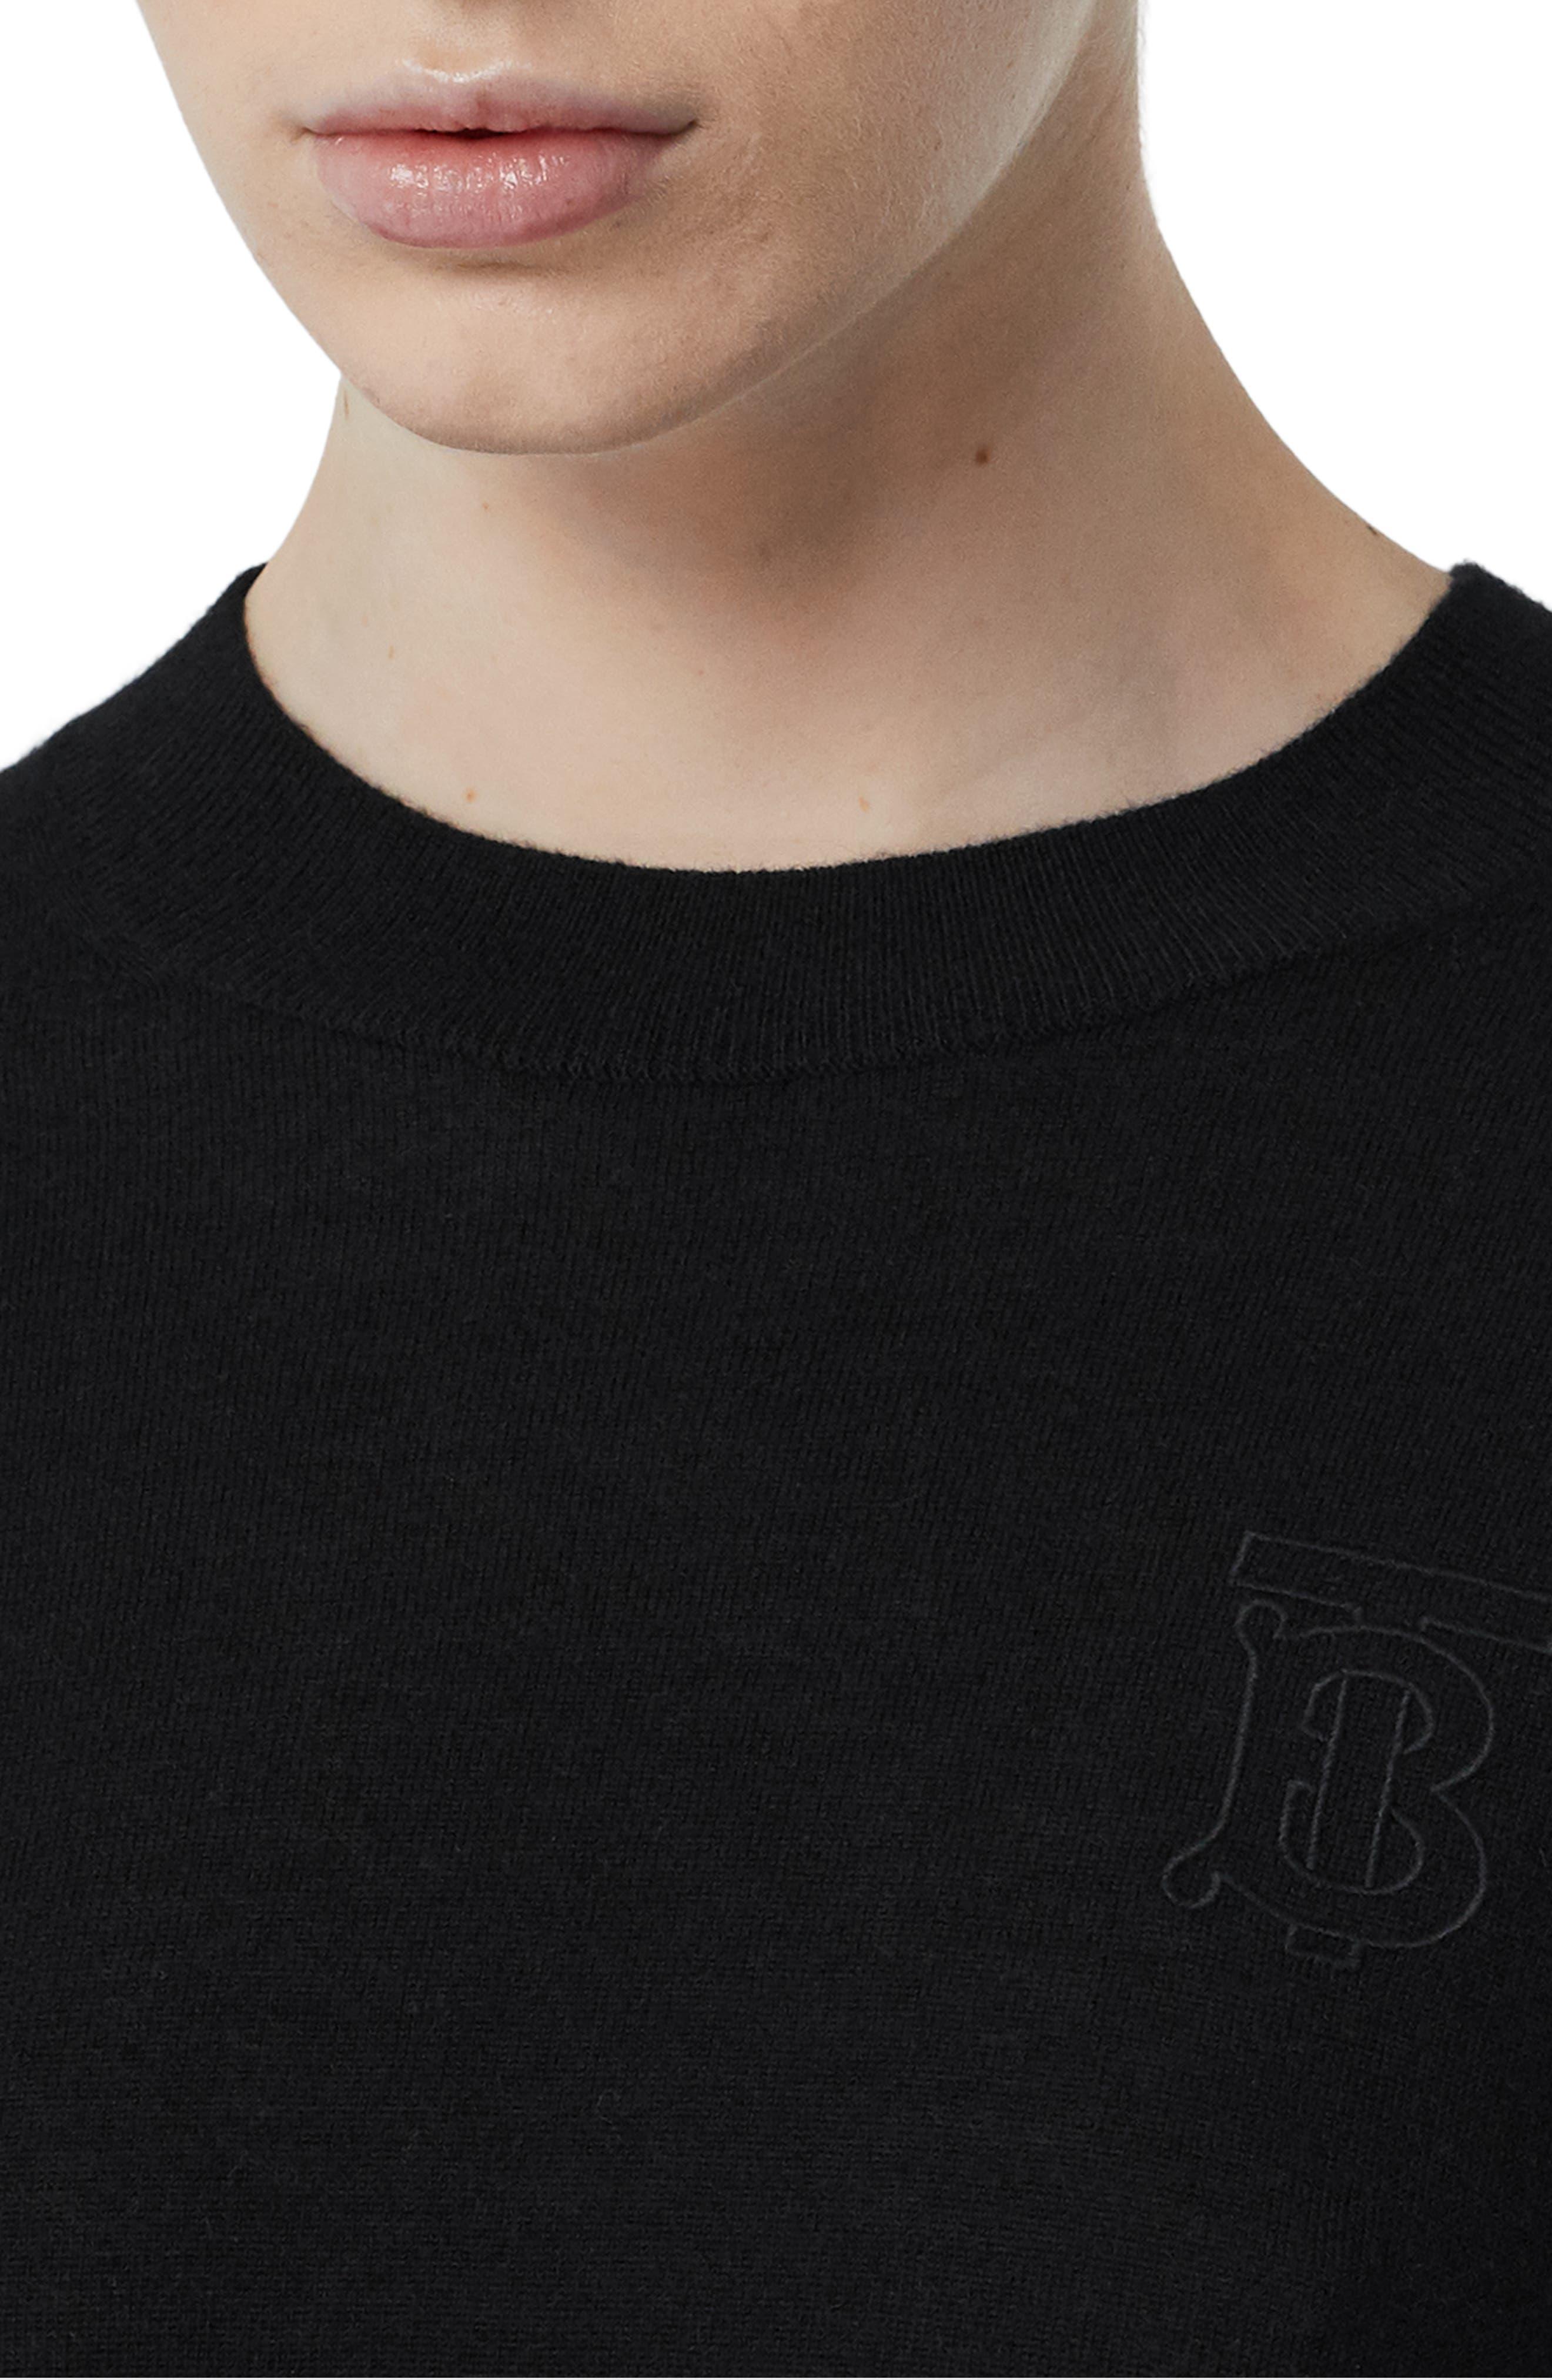 BURBERRY, Callery Monogram Logo Cashmere Sweater, Alternate thumbnail 4, color, BLACK